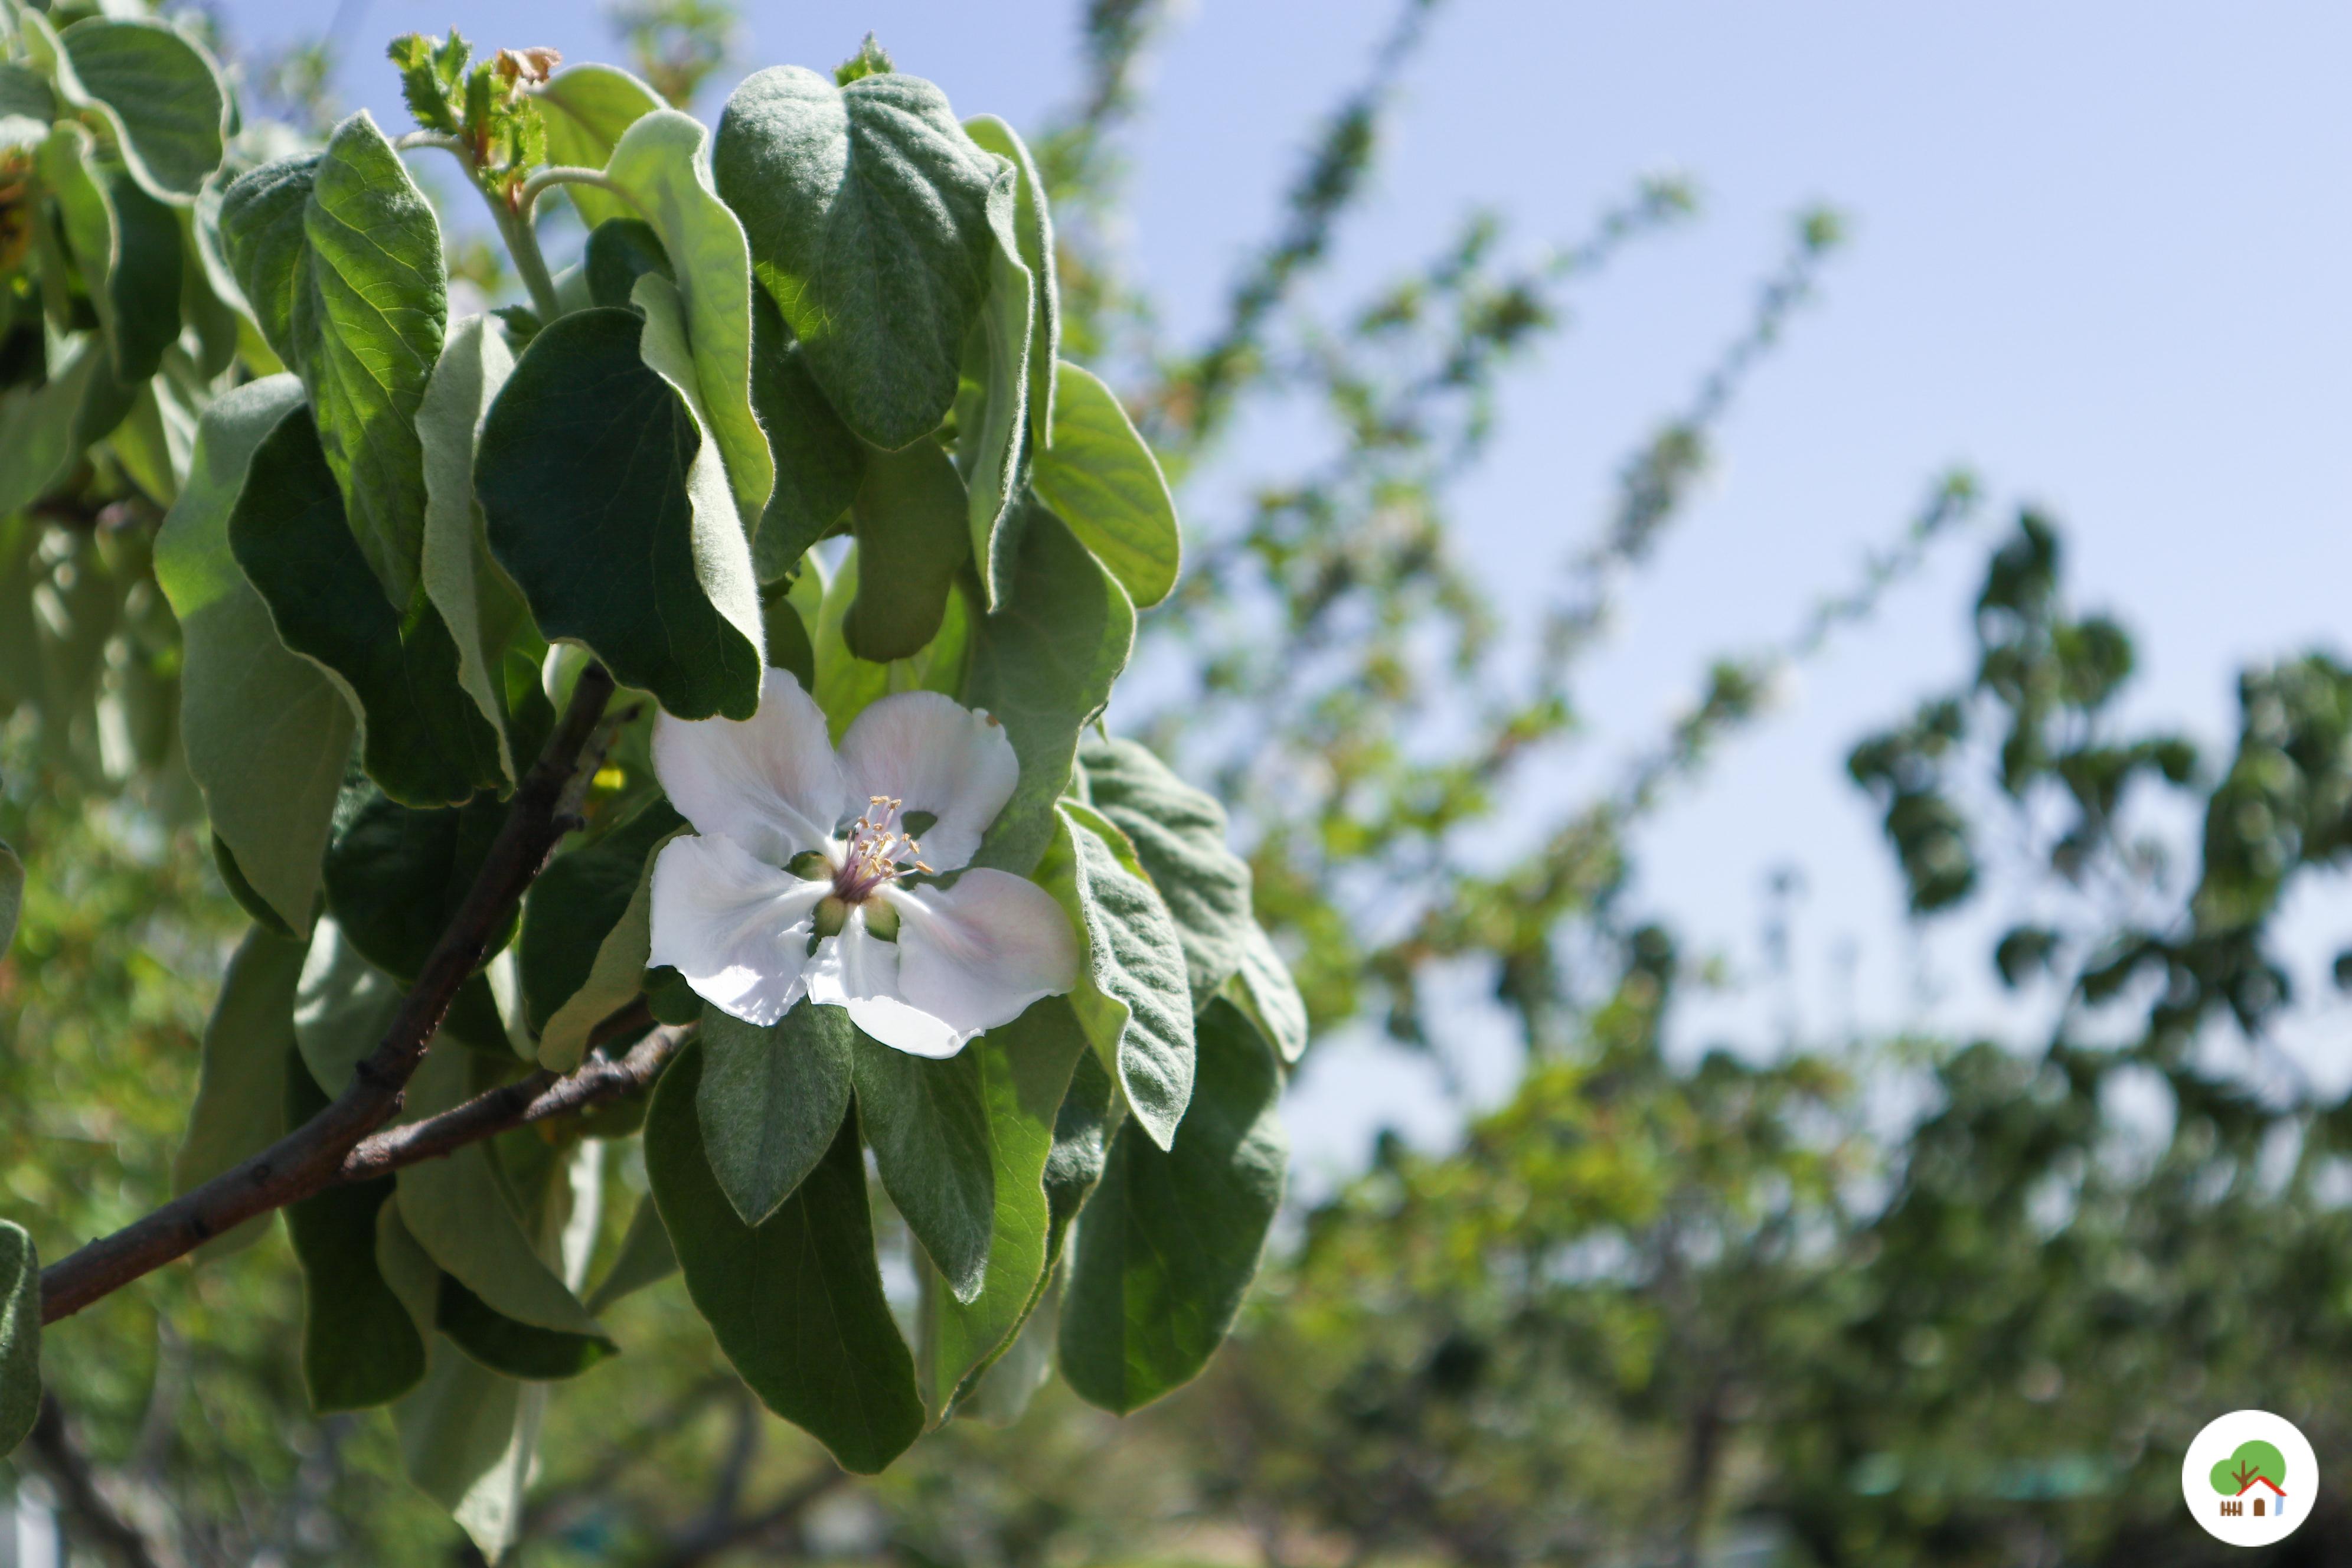 Frutales en el huerto, Albitana